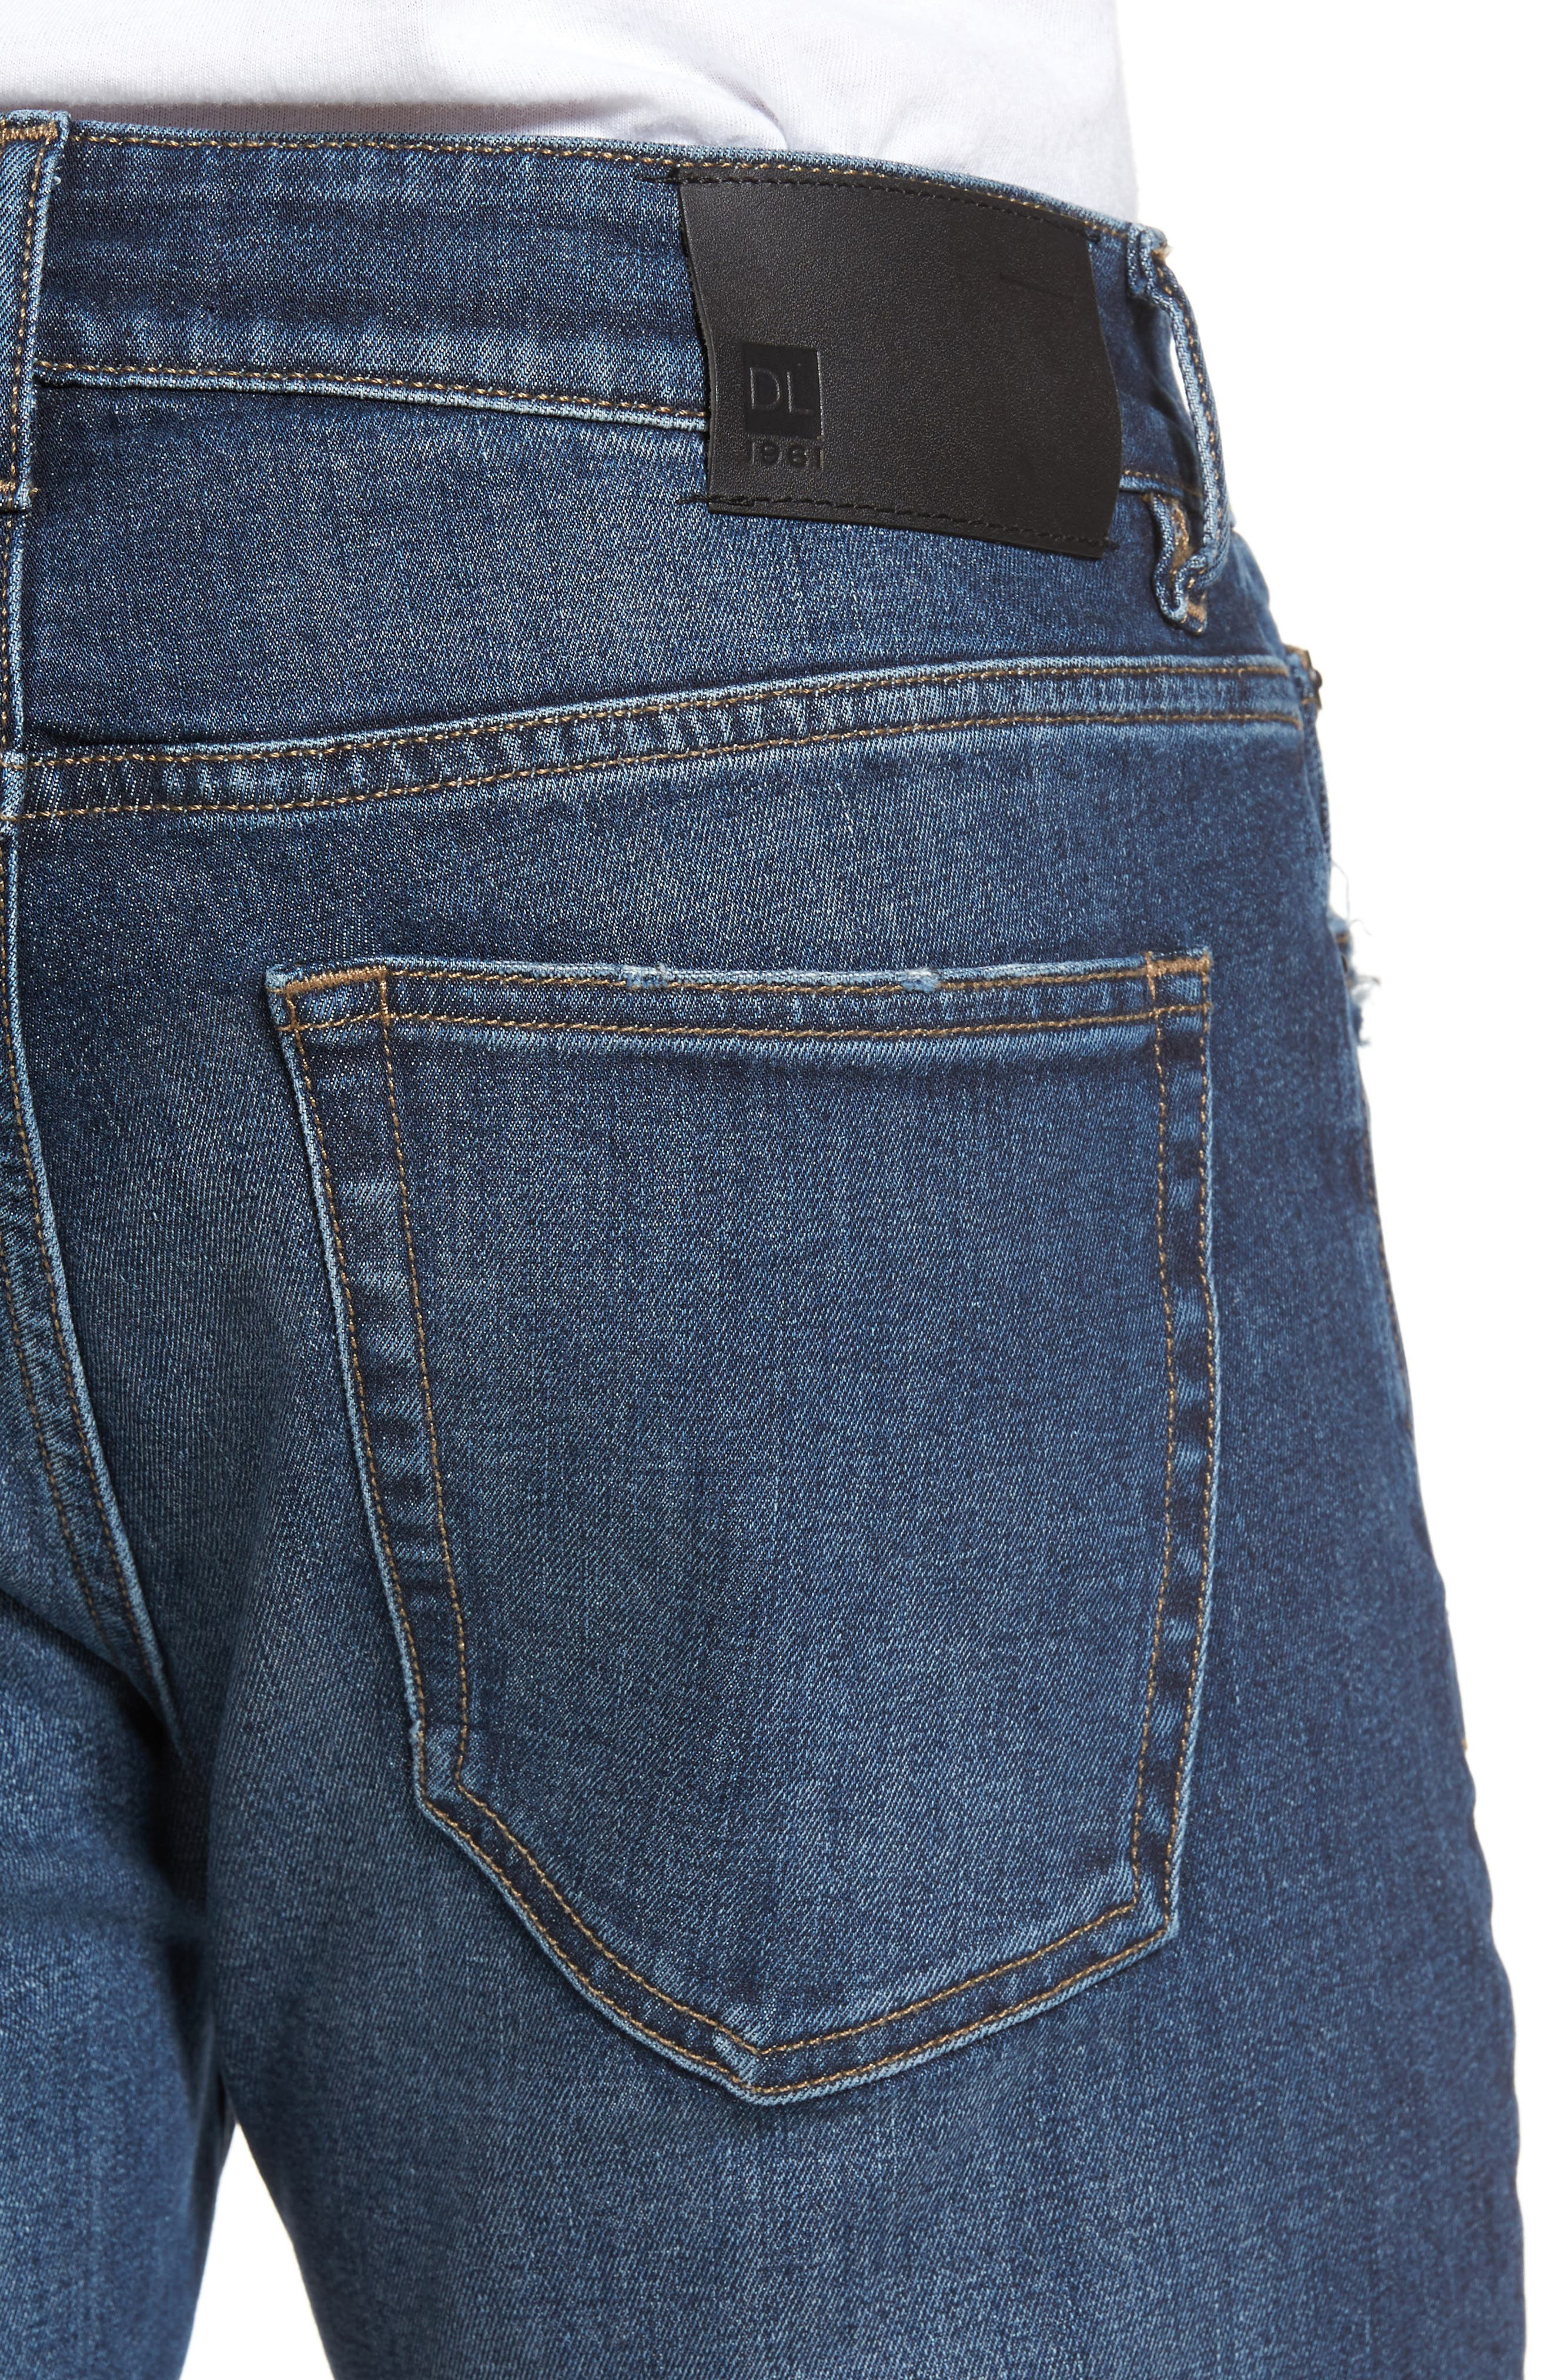 Nick Slim Fit Jeans,                             Alternate thumbnail 4, color,                             406